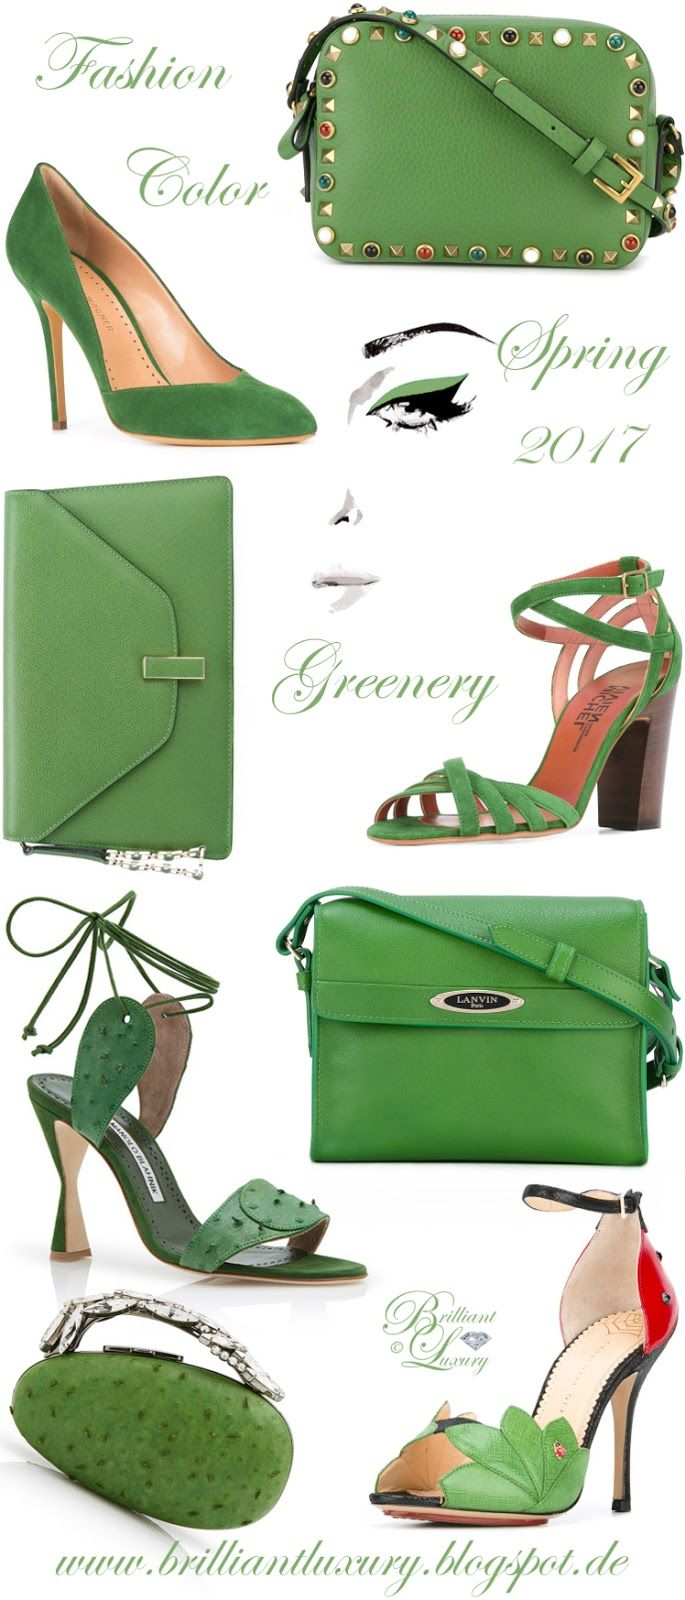 Brilliant Luxury by Emmy DE ♦ Fashion Color Spring 2017 ~ greenery